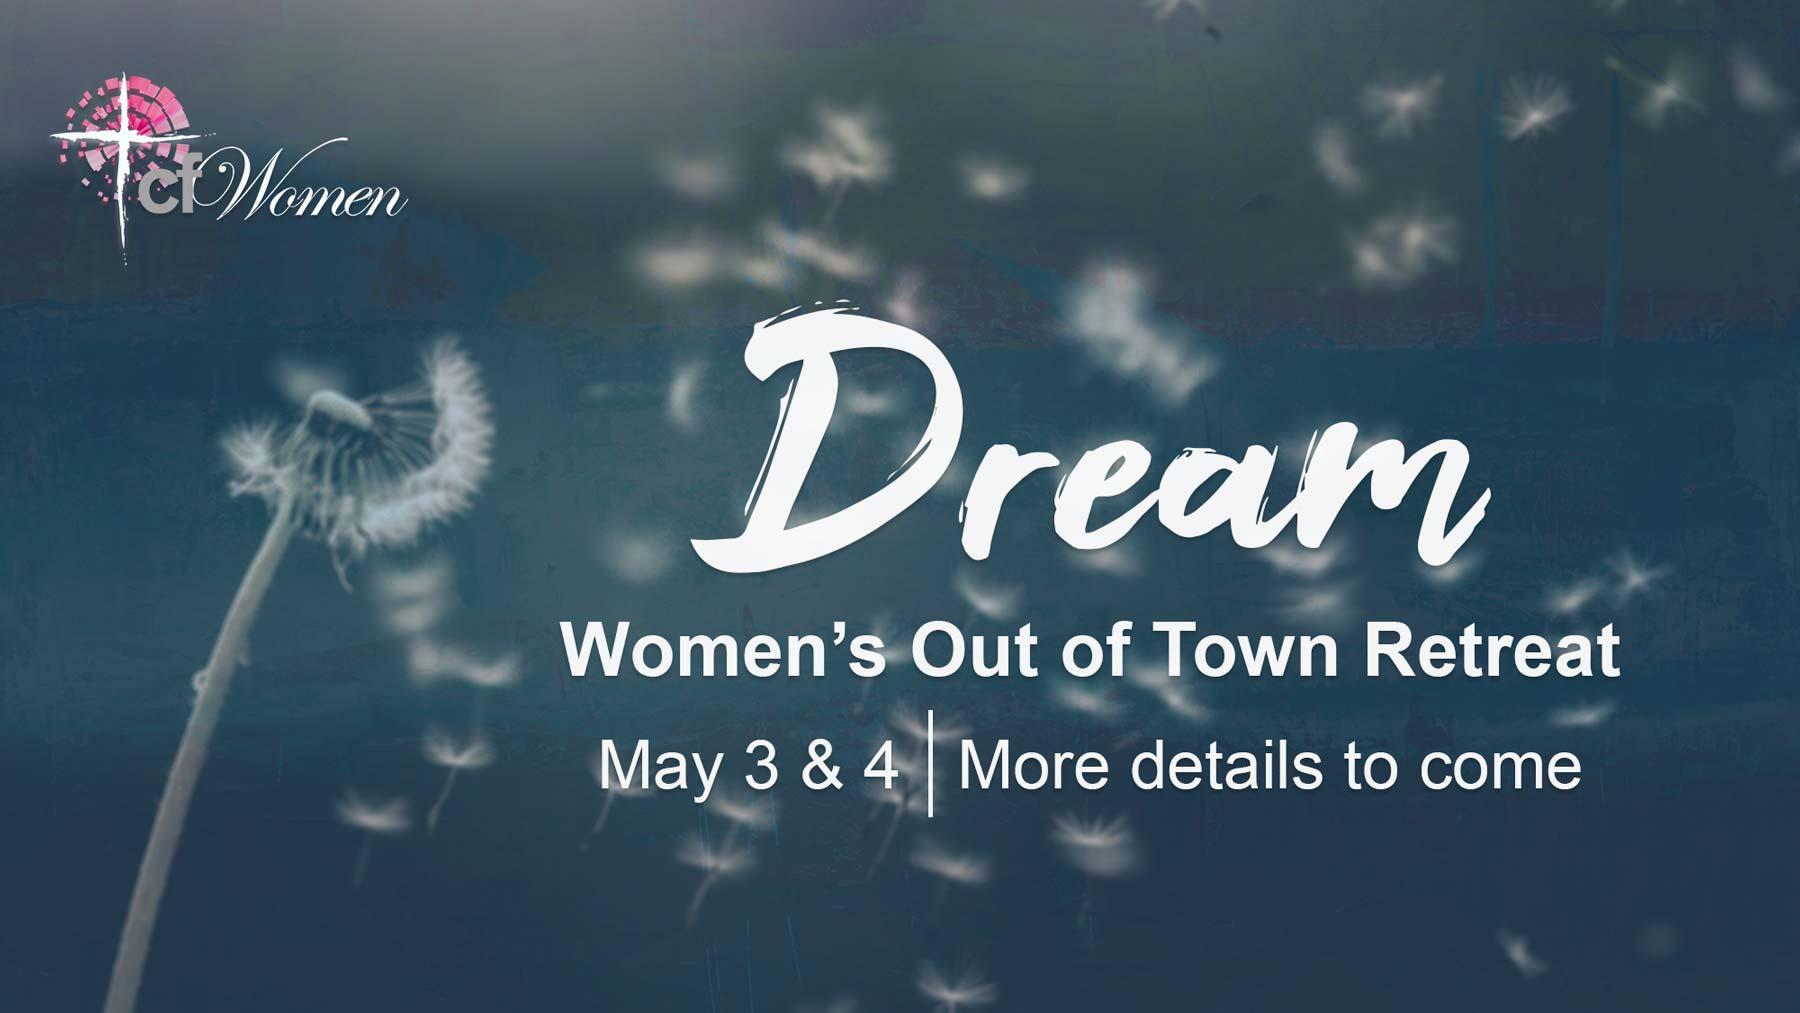 Christian Fellowship Church's 2019 Women's Retreat at Osage Beach